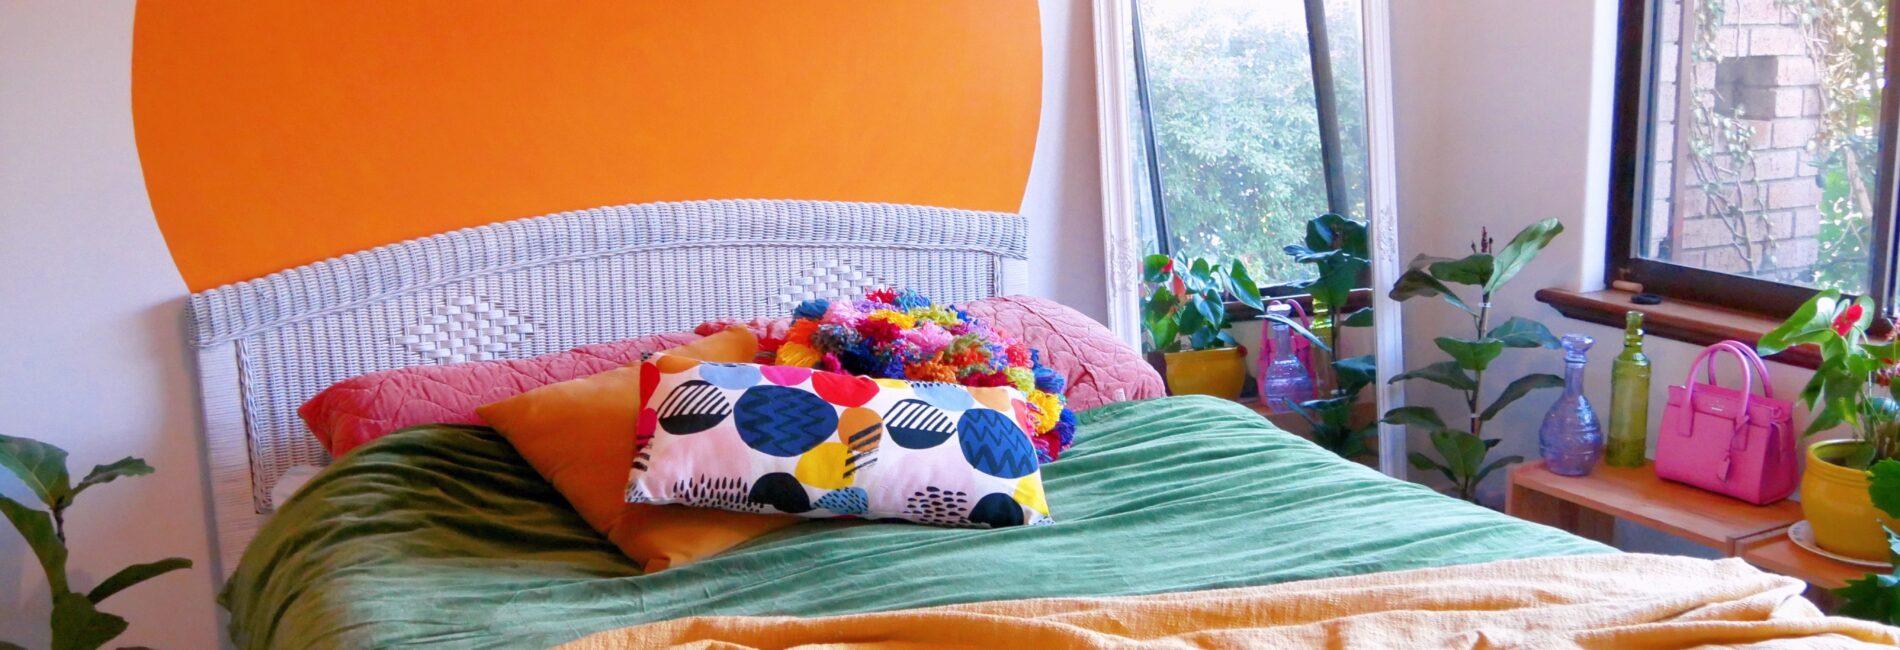 DIY Giant Painted Circle: Home Renovation Diaries #4